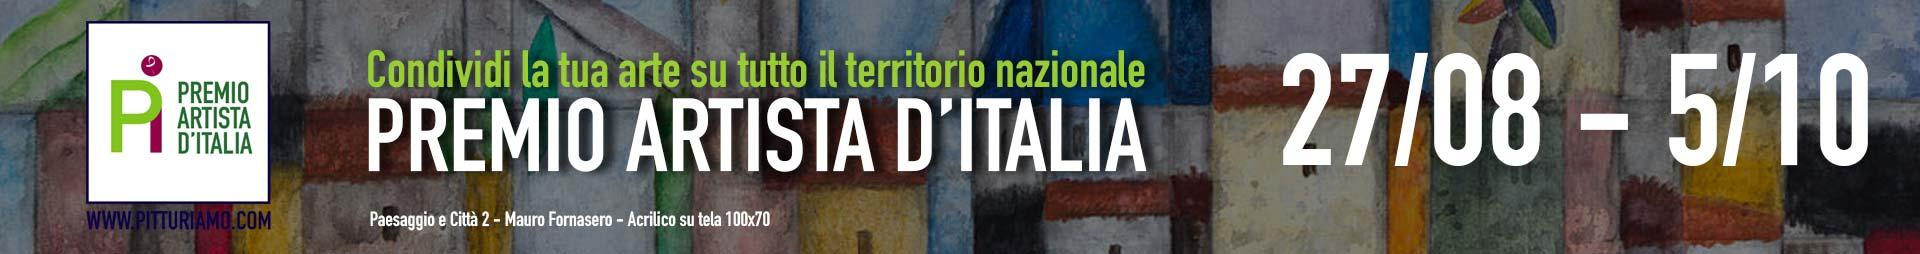 Partecipa al premioArtista d'Italia